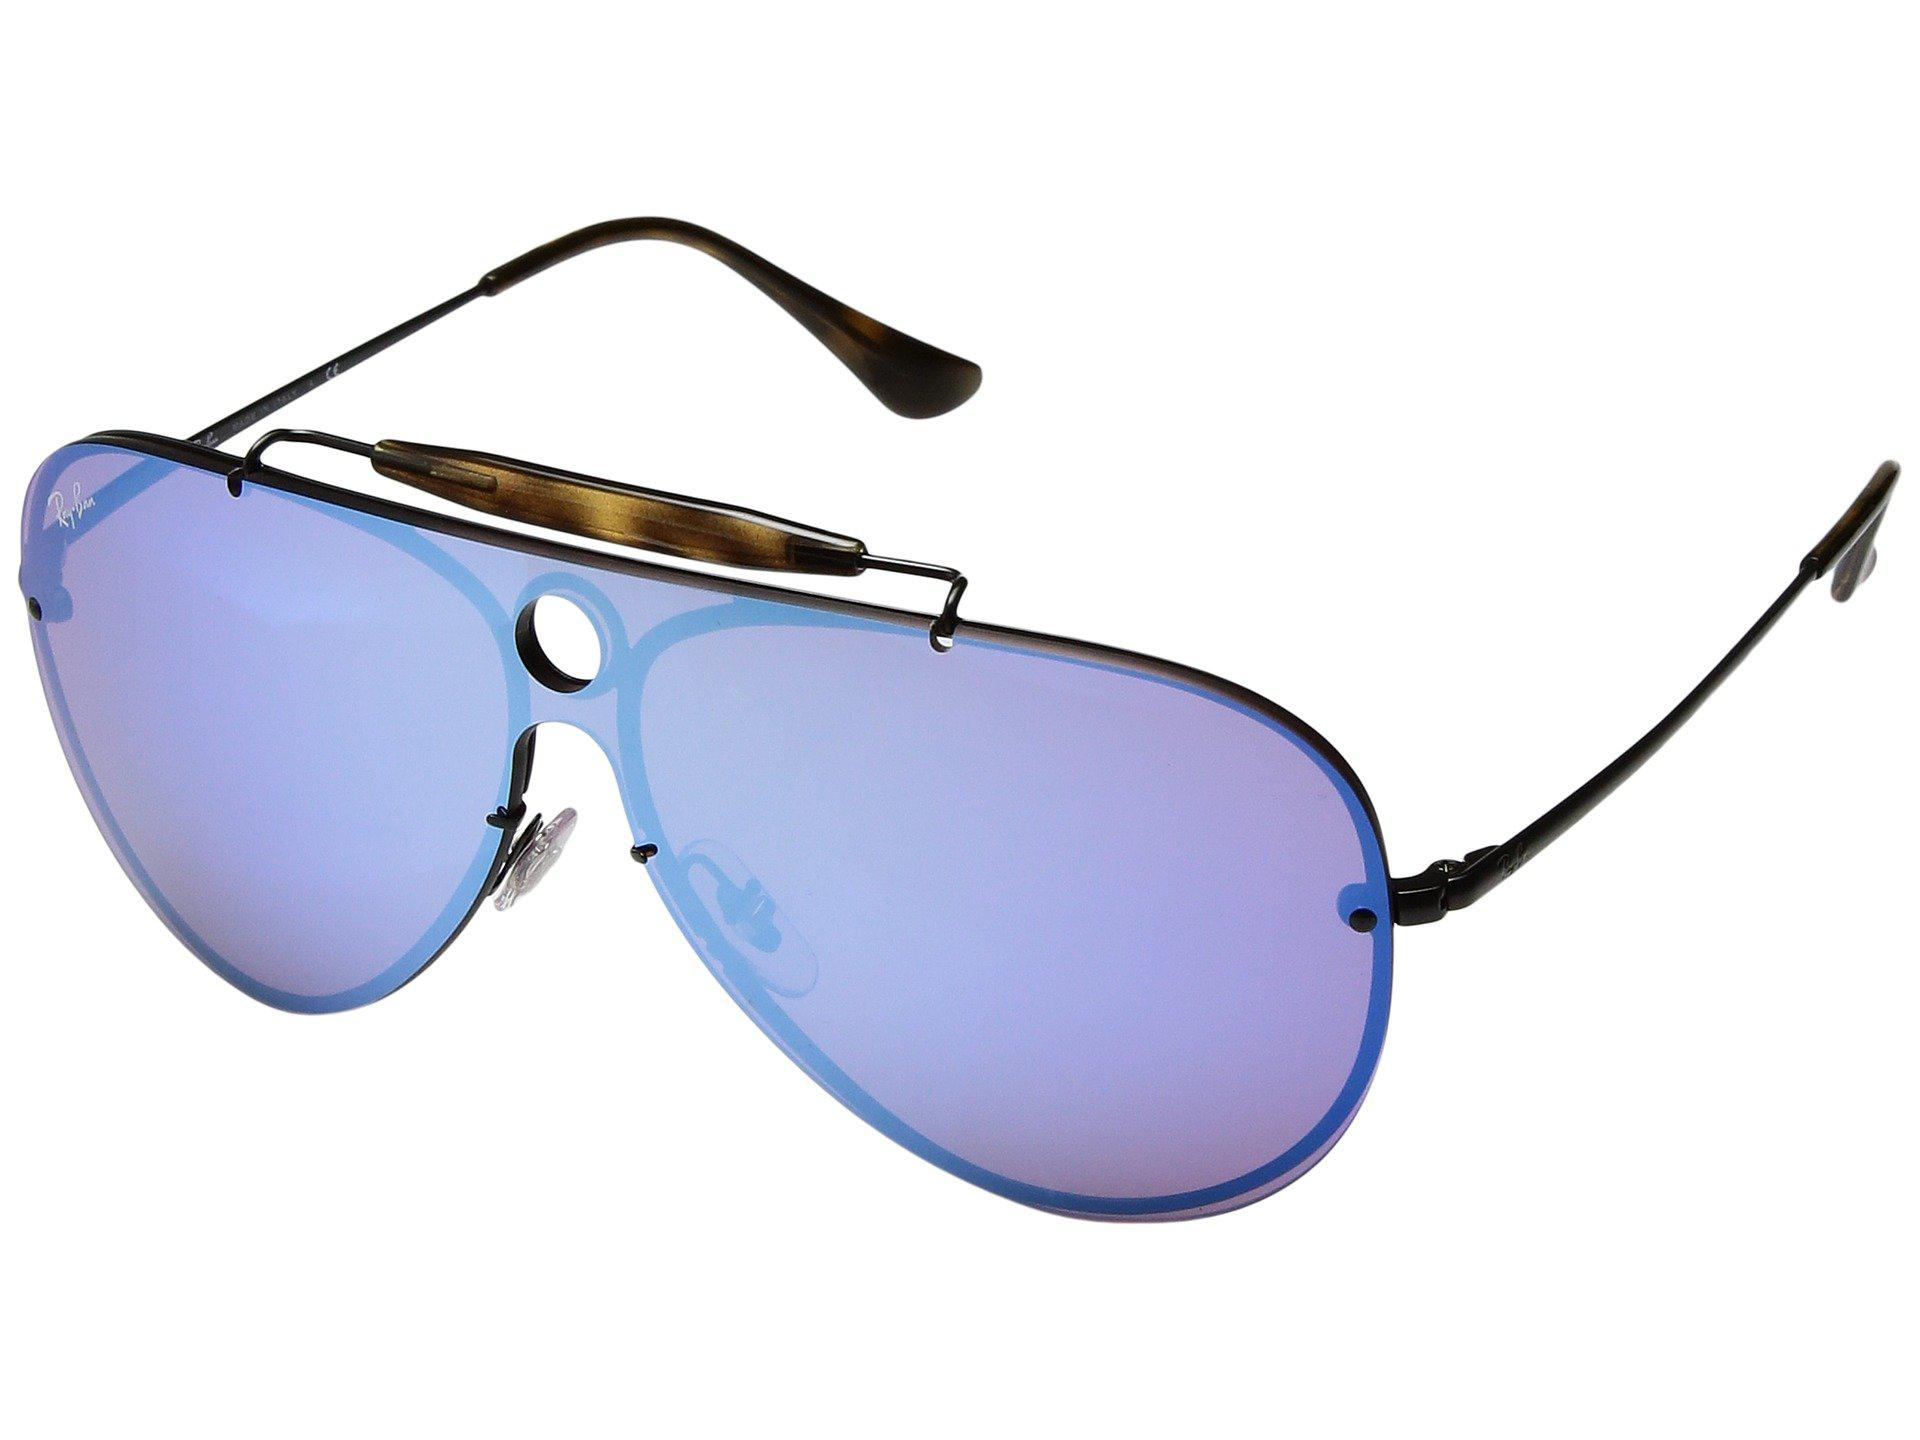 47178f6077 Lyst - Ray-Ban Blaze Shooter Rb3581n 32mm (black dark Blue Mirror ...